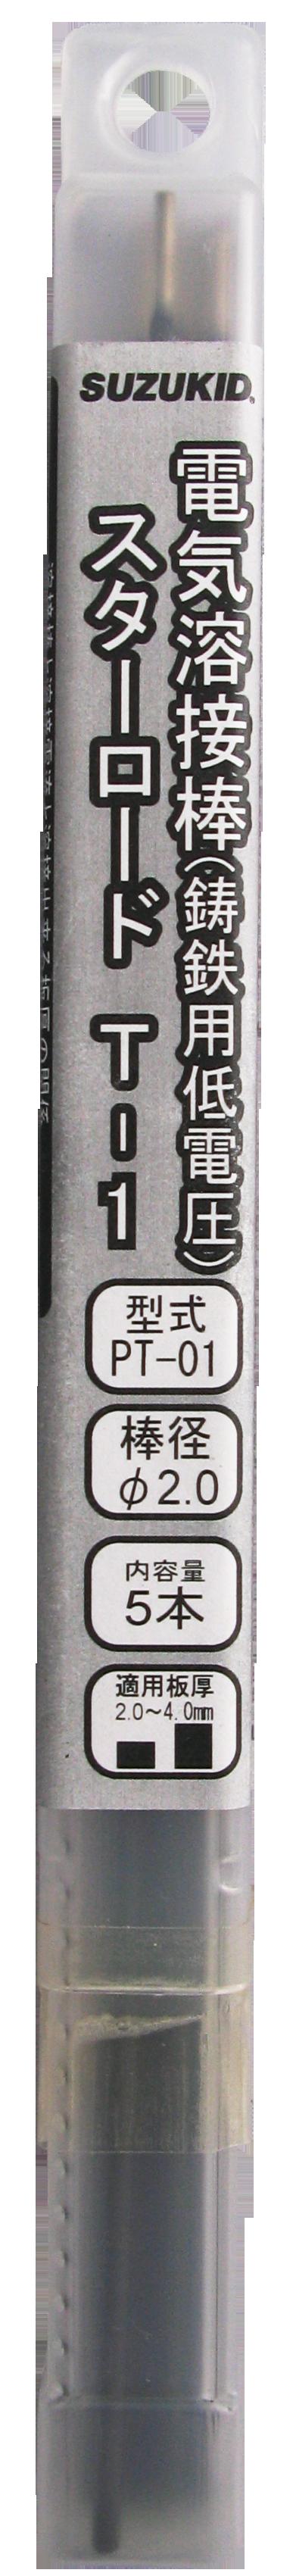 低電圧鋳物用被覆アーク溶接棒 T-1